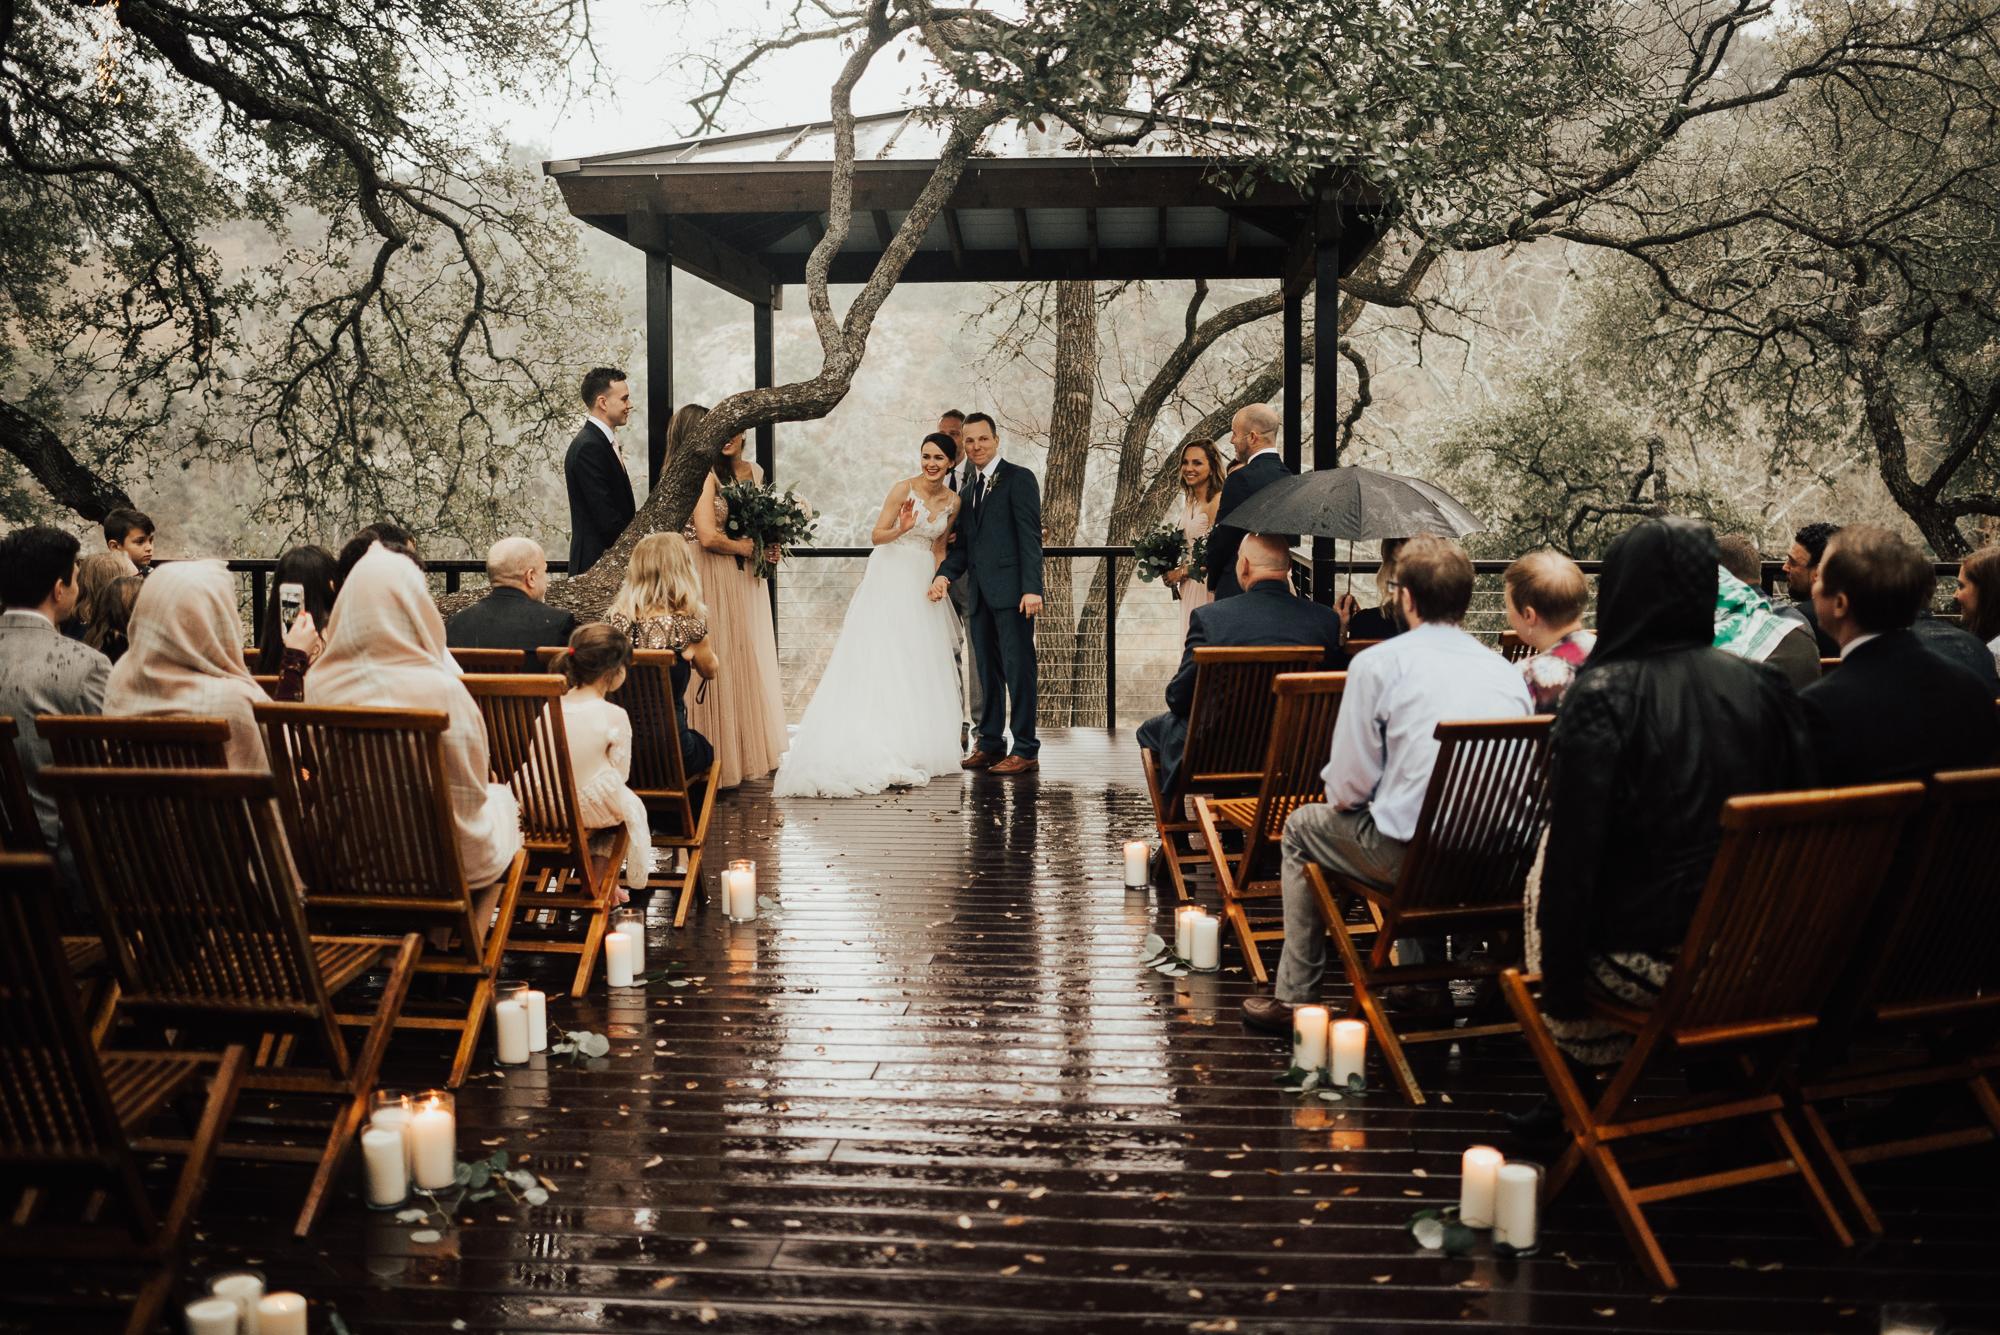 camp-lucy-wedding-251.jpg